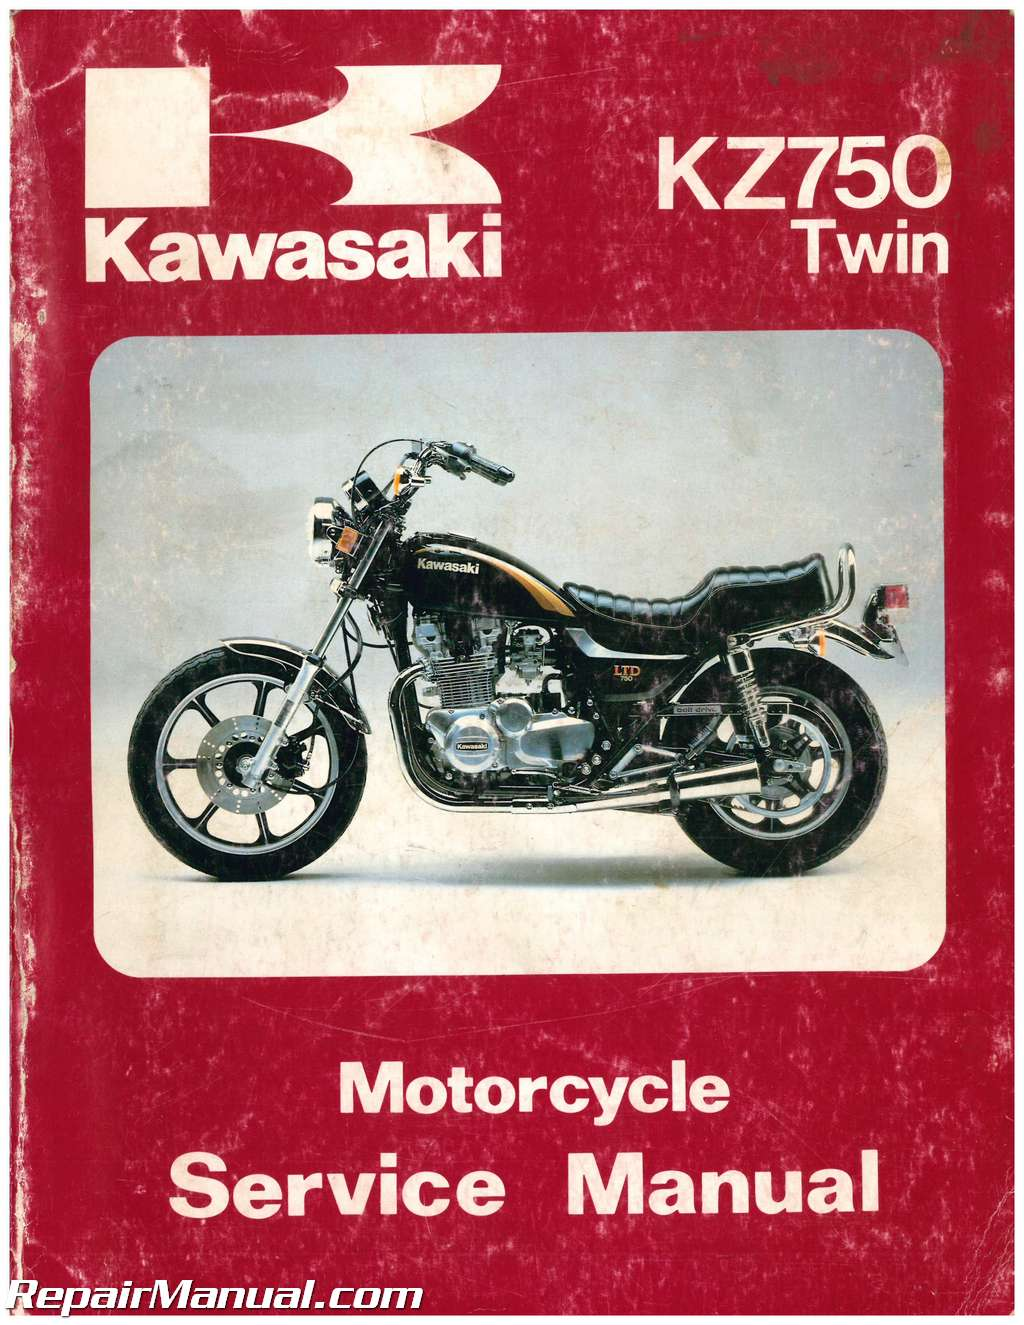 Kawasaki Kz750 Wiring Diagram On Wiring Diagram For 1983 Gpz 750